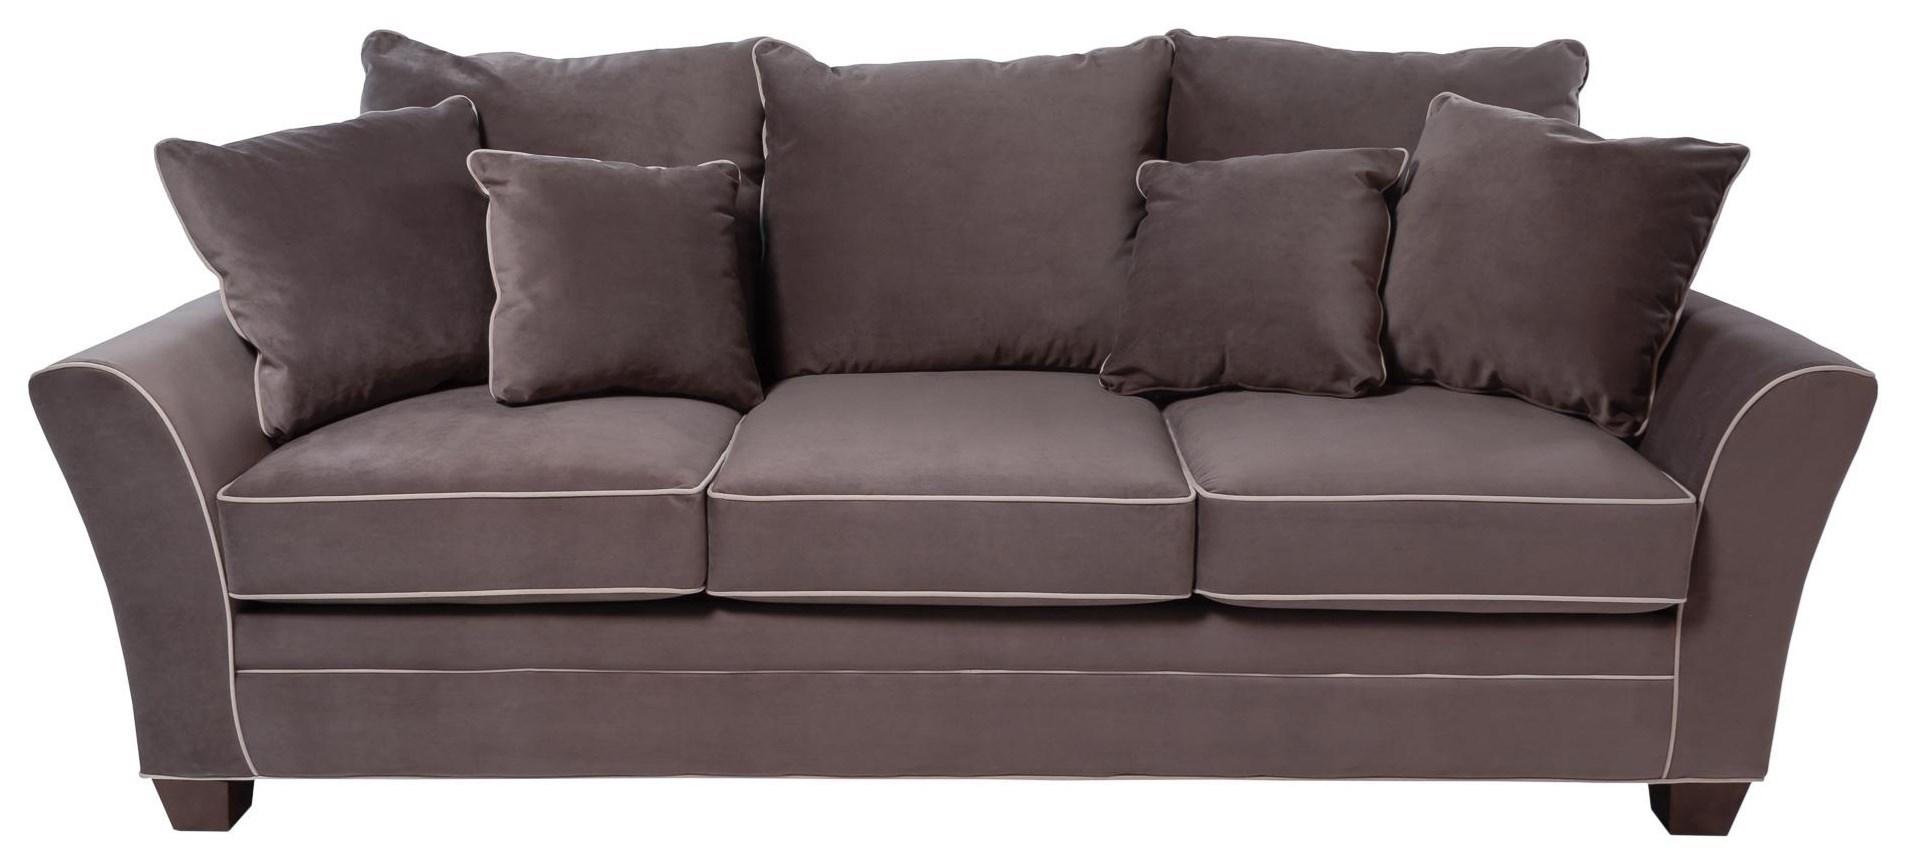 Encore Contemporary Sofa with Block Feet